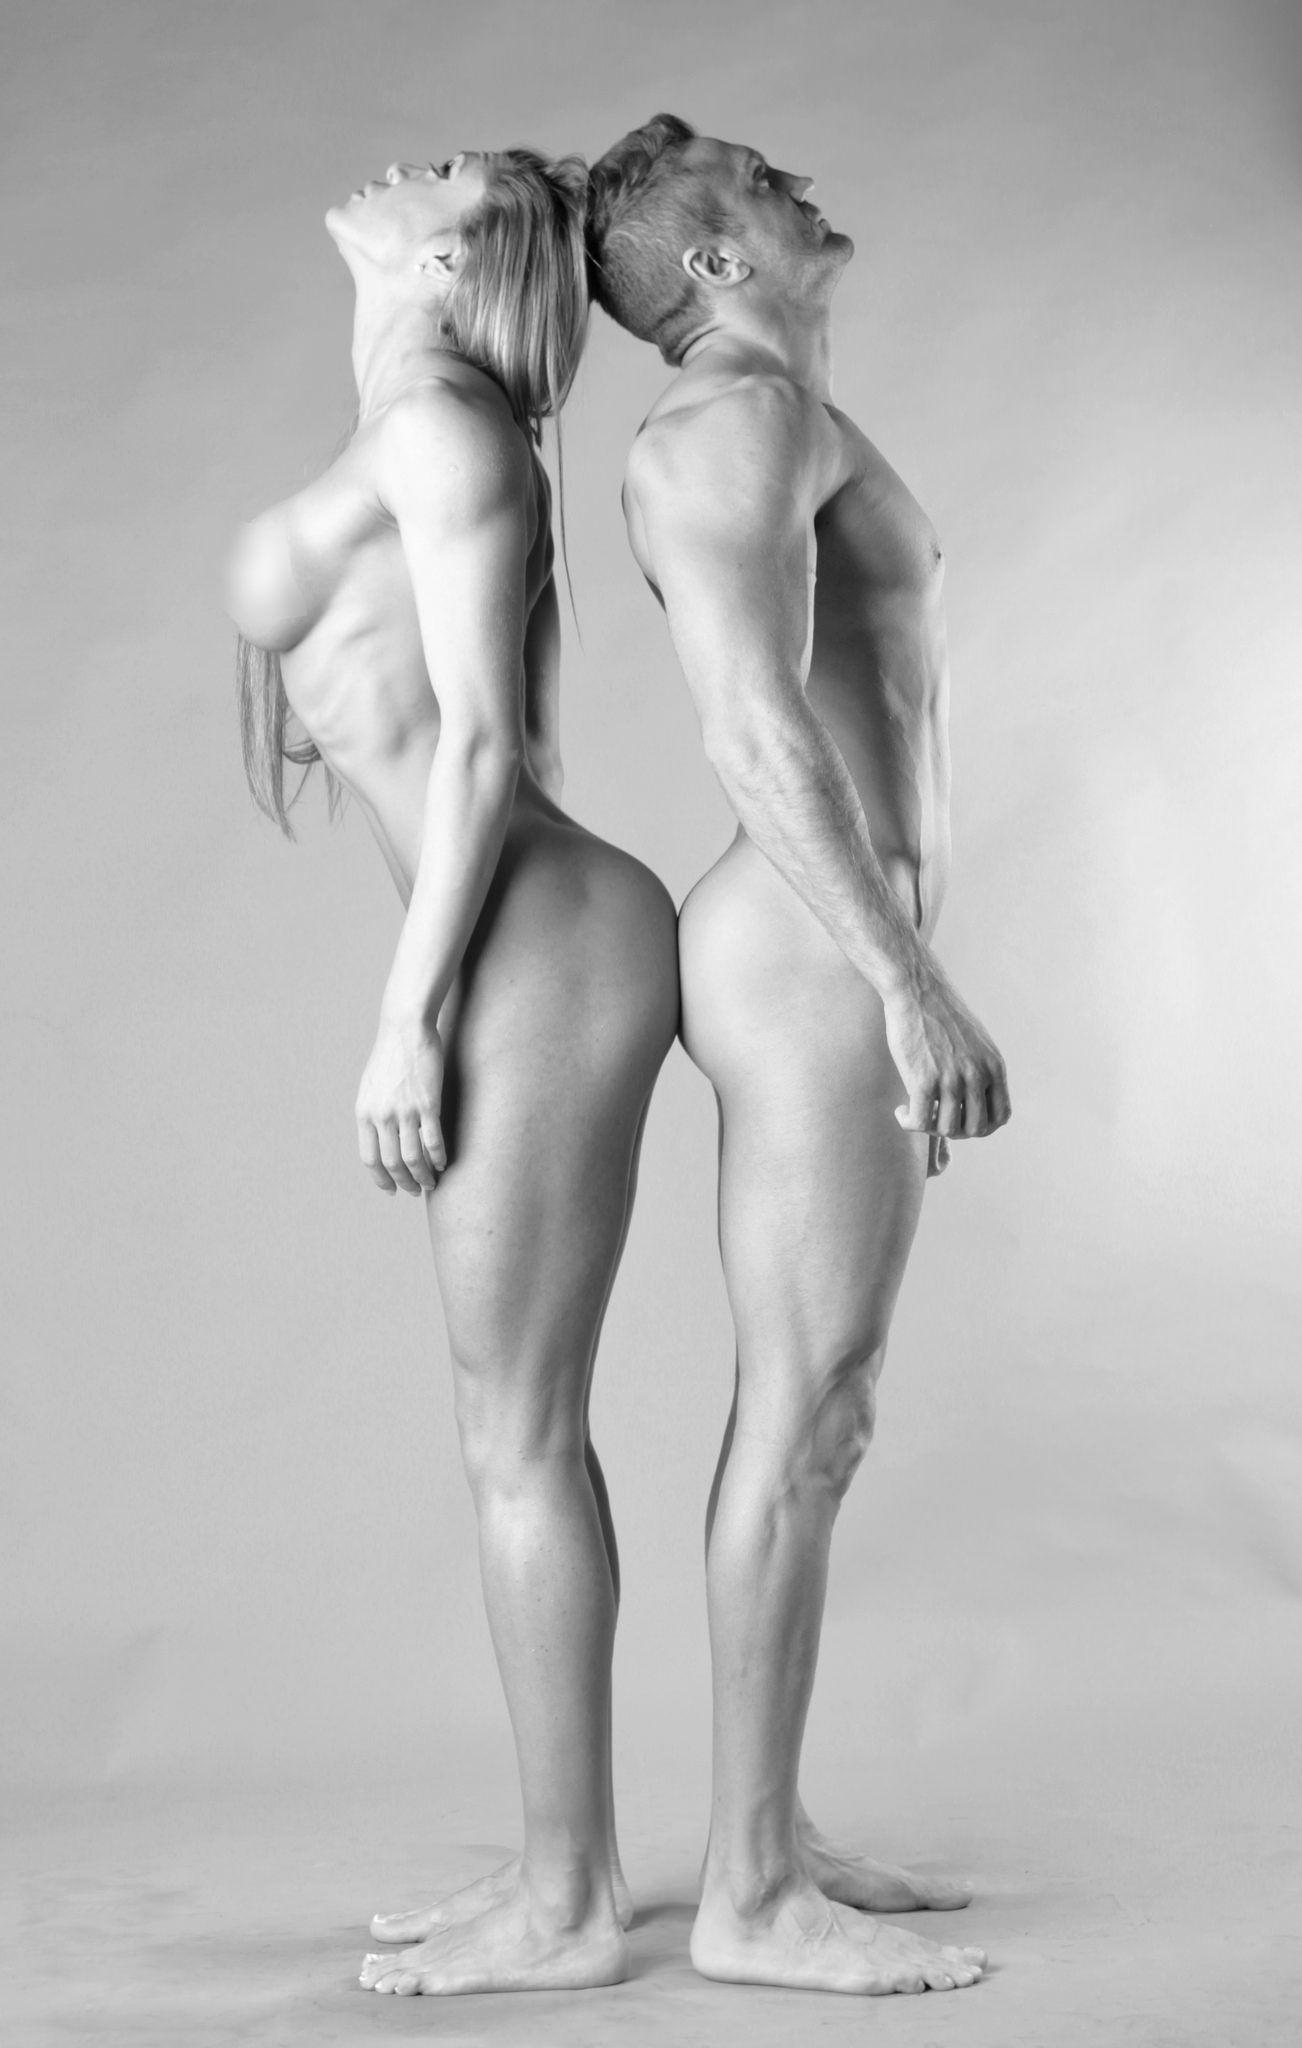 Pamela Pombo | ANATOMY / FIGURE STUDIES | Pinterest | Anatomy ...